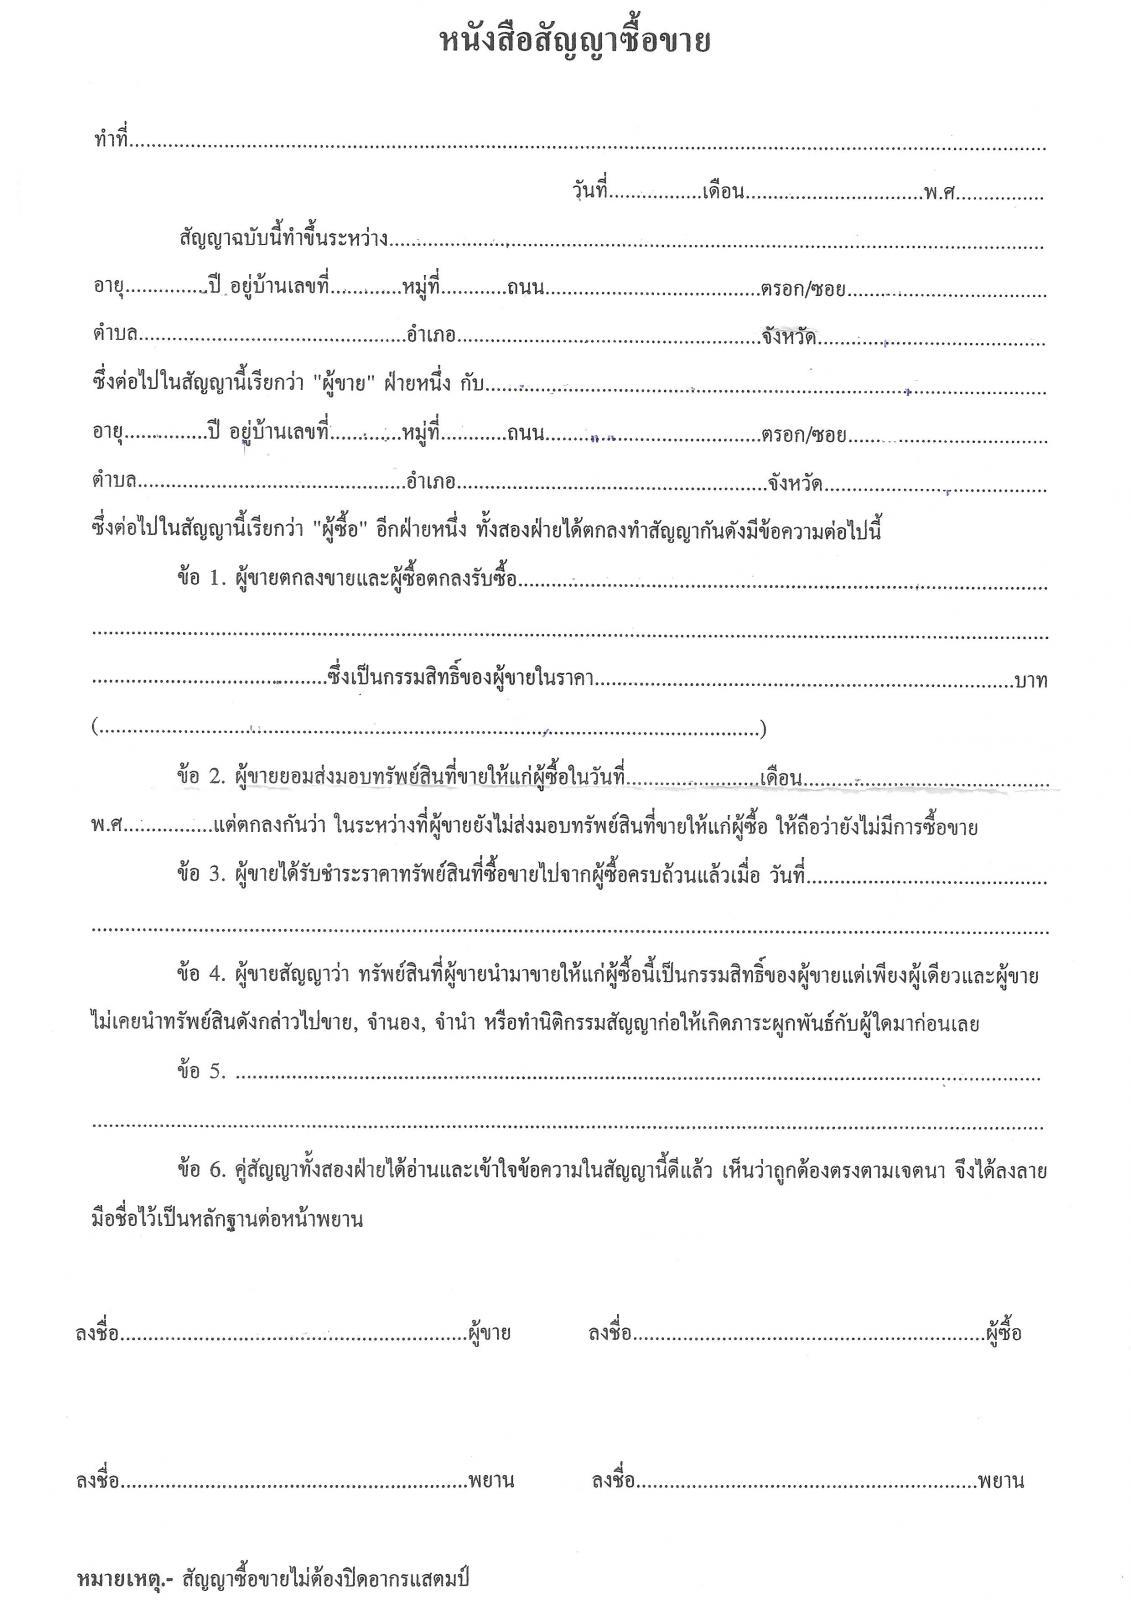 power of attorney form thailand pdf  Car title.....farang to farang - Thailand Motor Forum ...